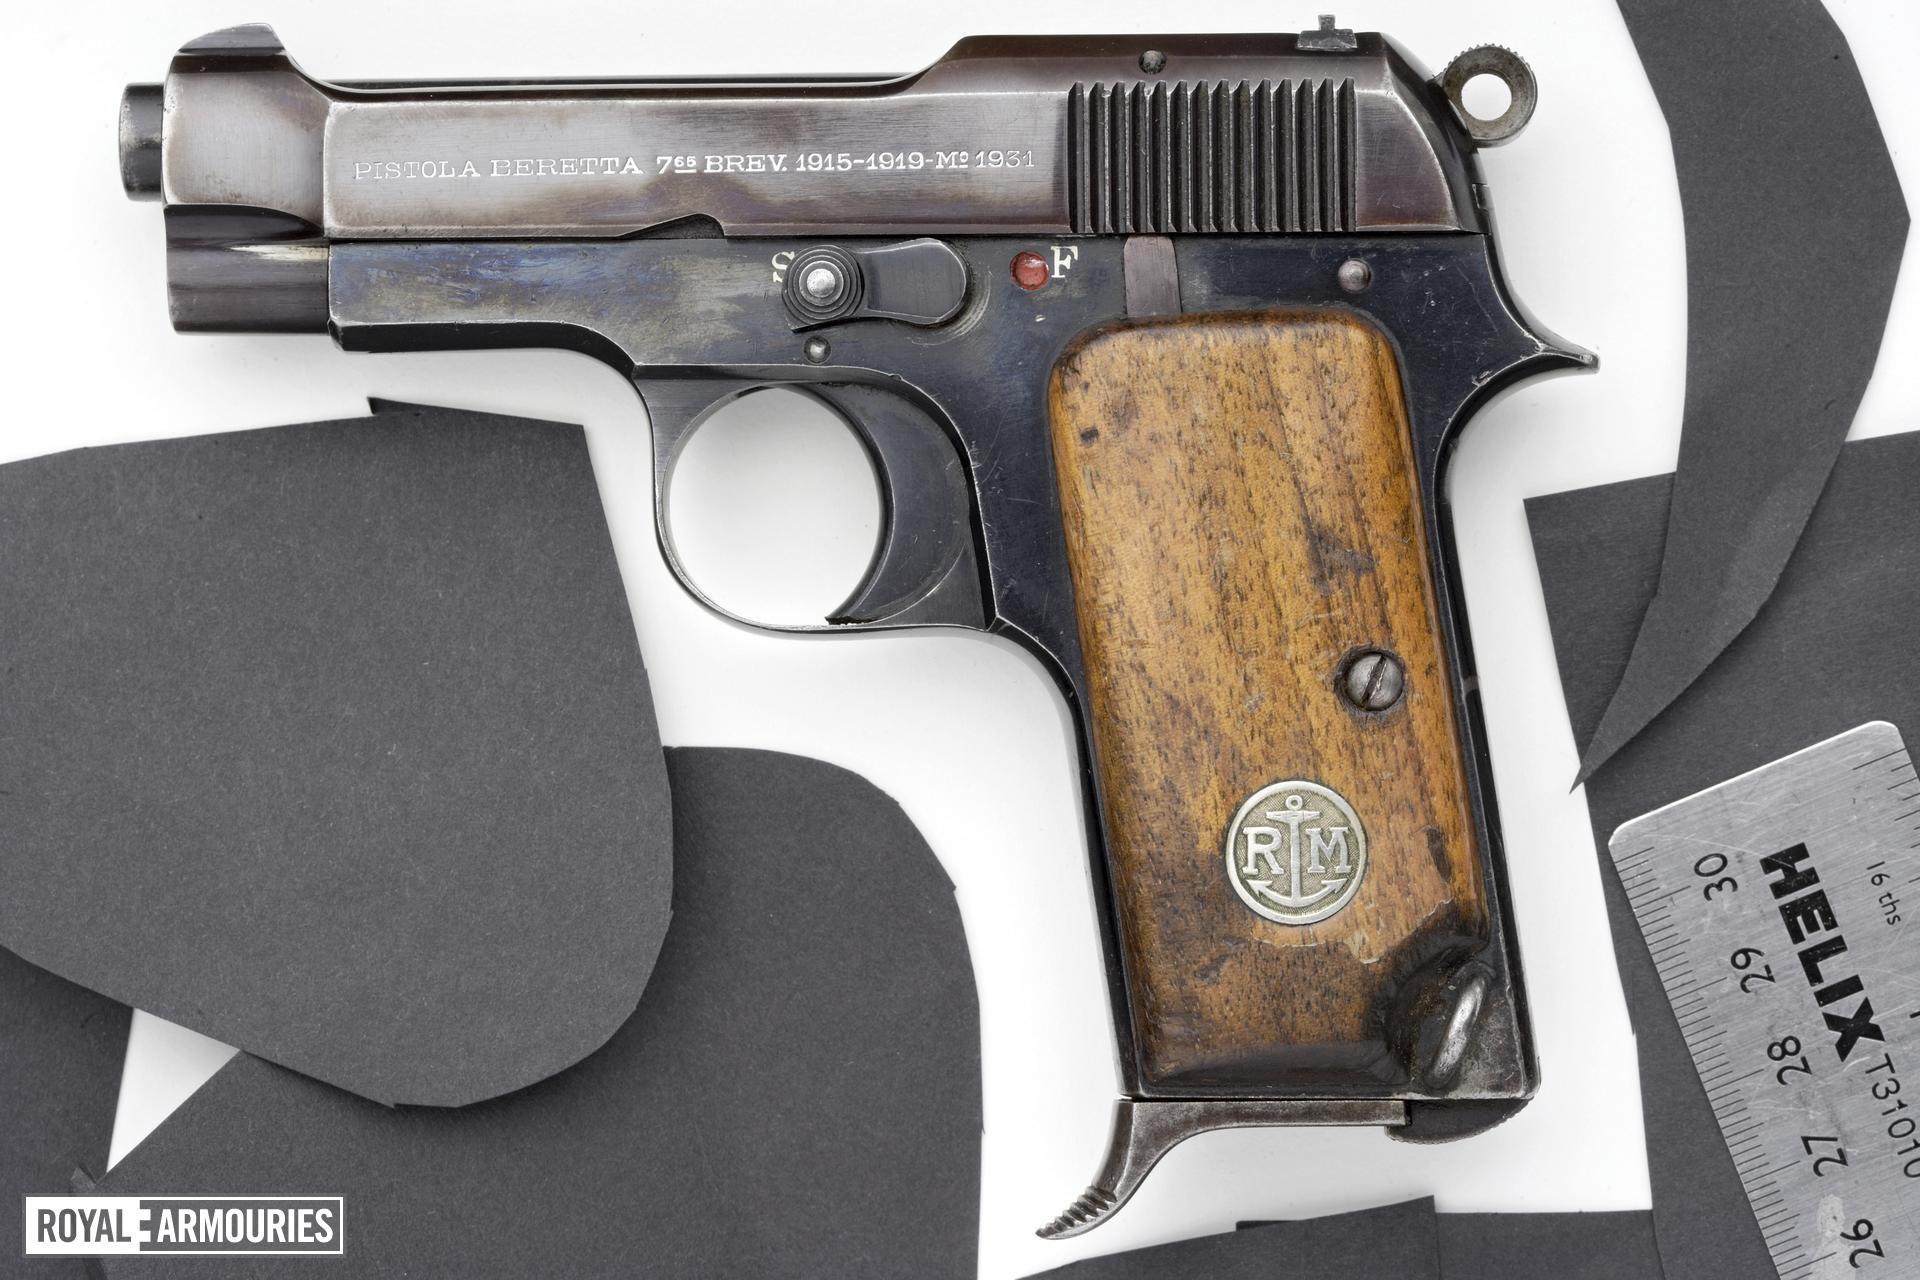 Centrefire self-loading pistol - Beretta Model 1931